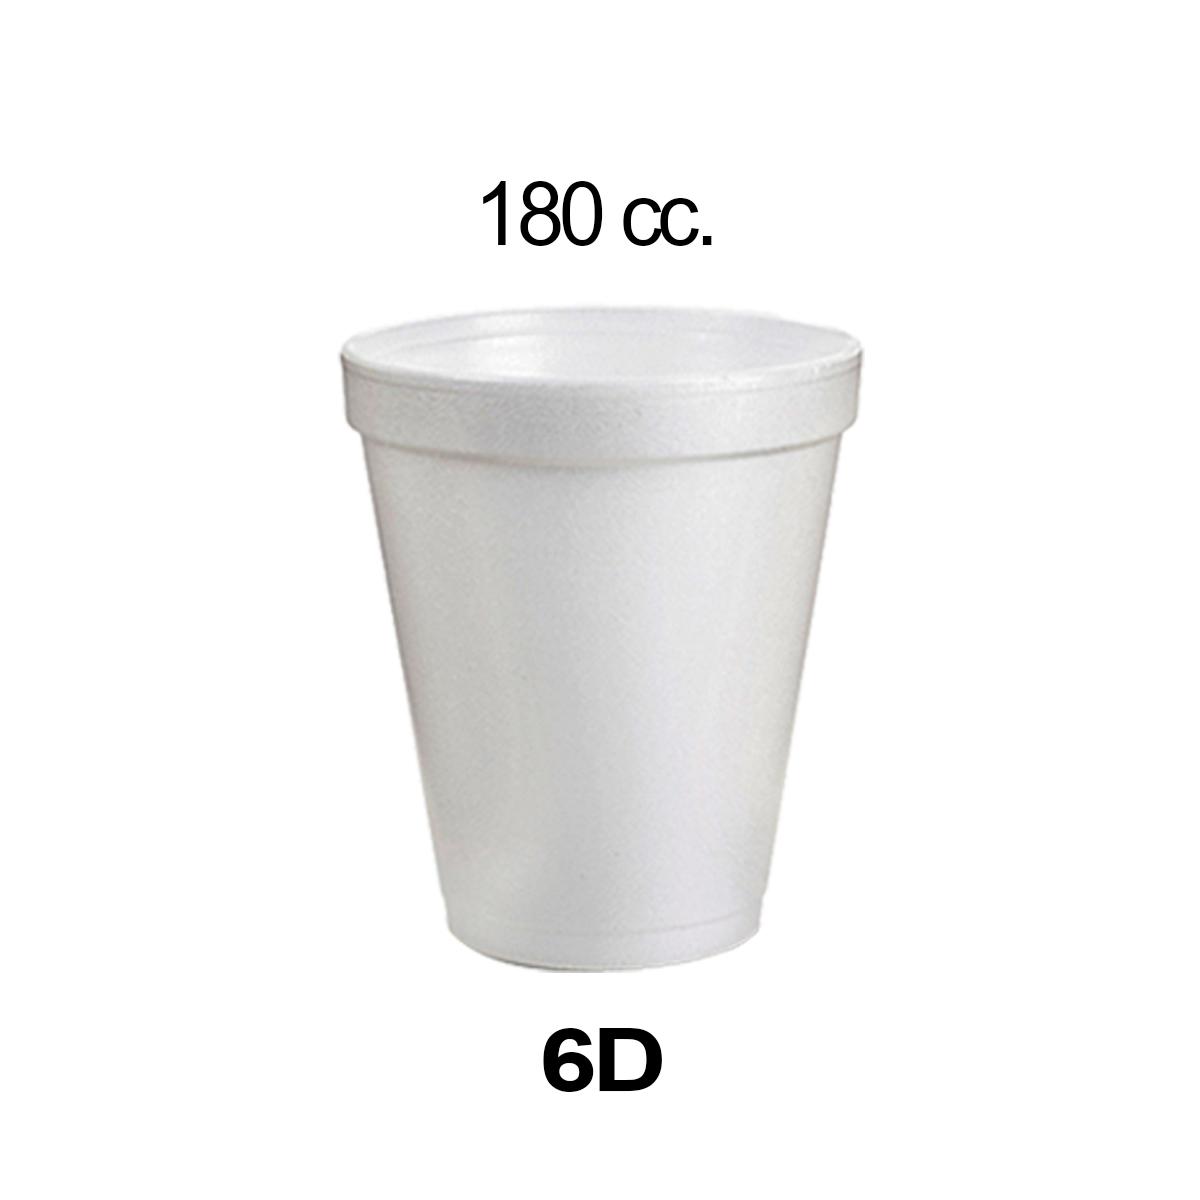 VASO ESPUMA 6D D690601N/DARNEL X20UNID.